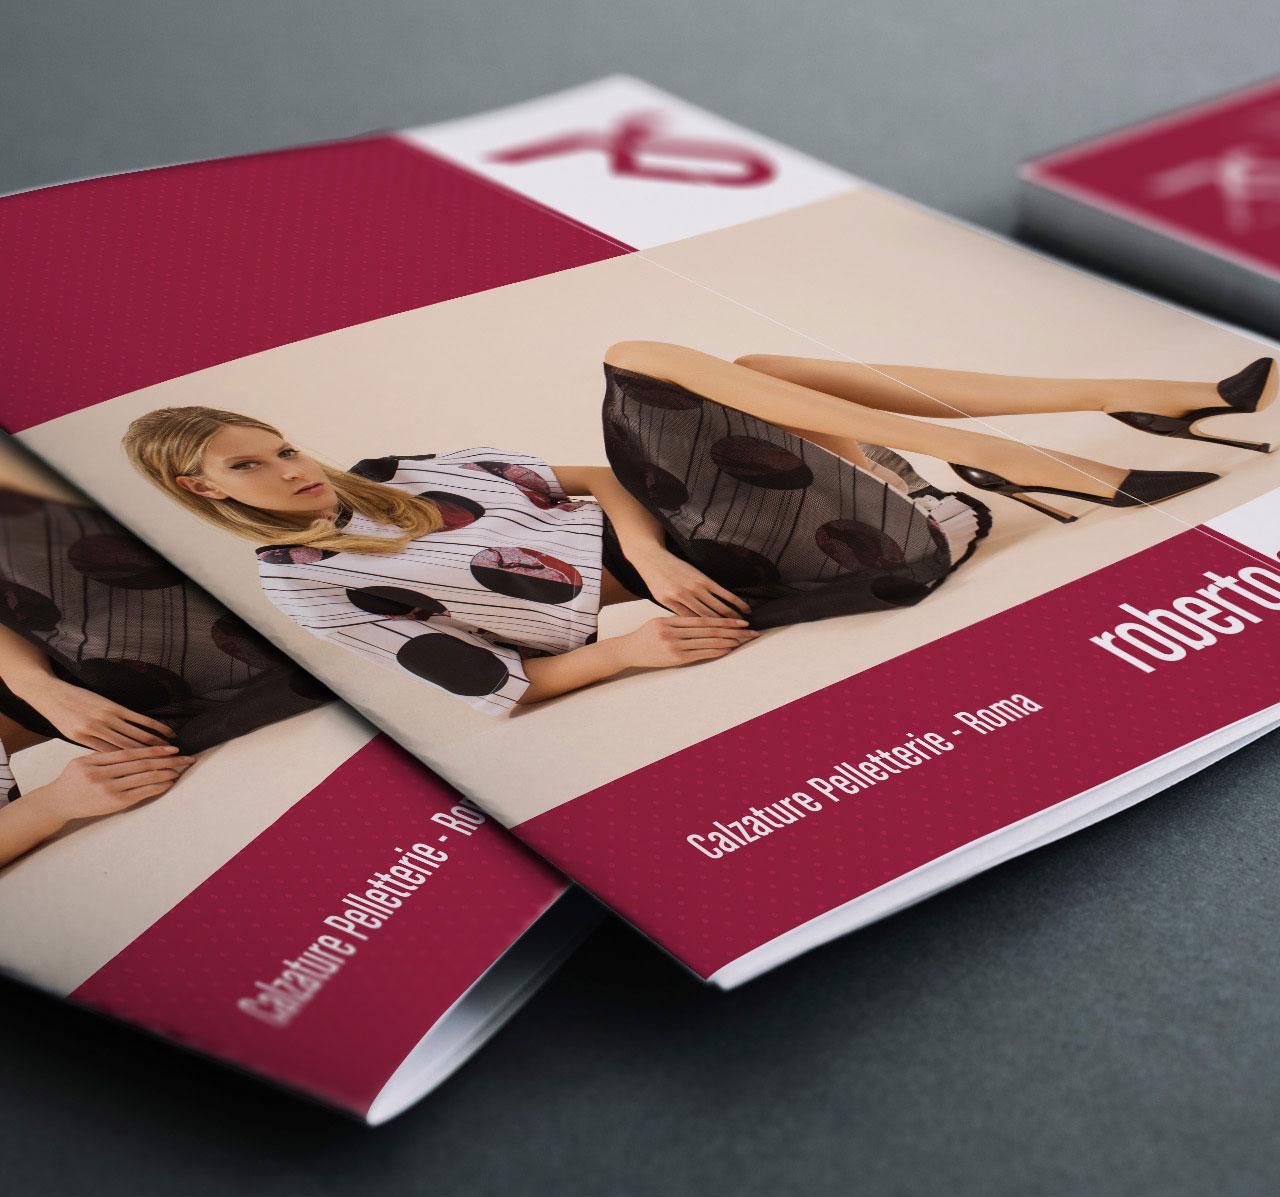 roberto spinelli calzature brochure istituzionale